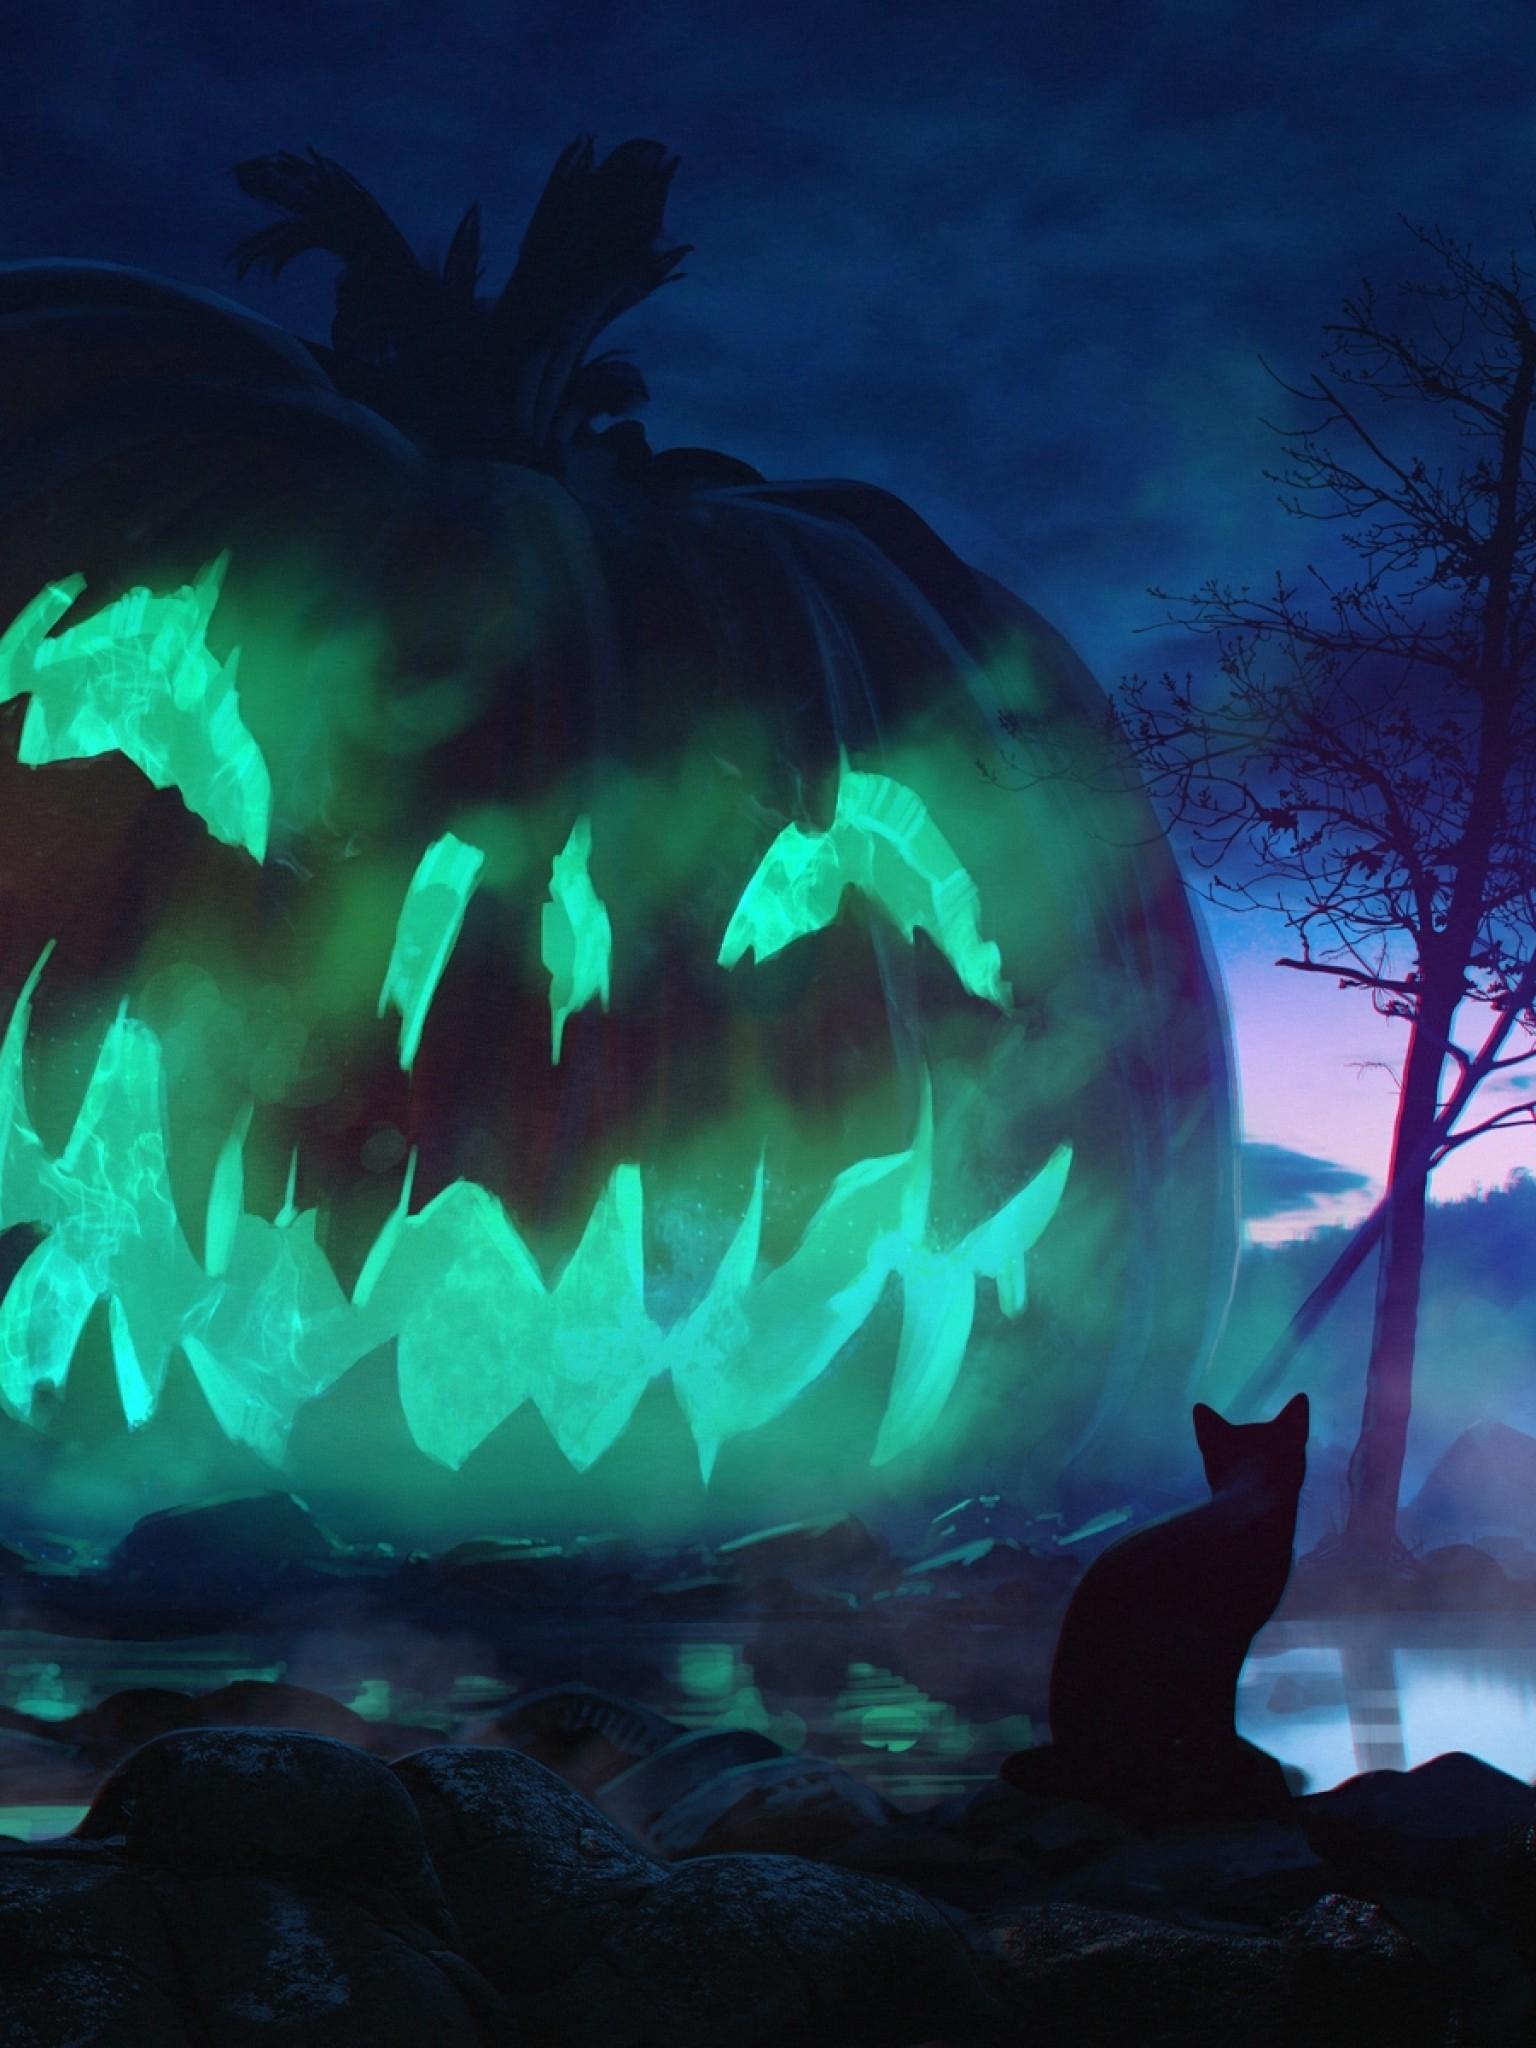 Halloween Giant Pumpkin Scary Cats Dark Theme Jack O Lantern Background 1536x2048 Wallpaper Teahub Io